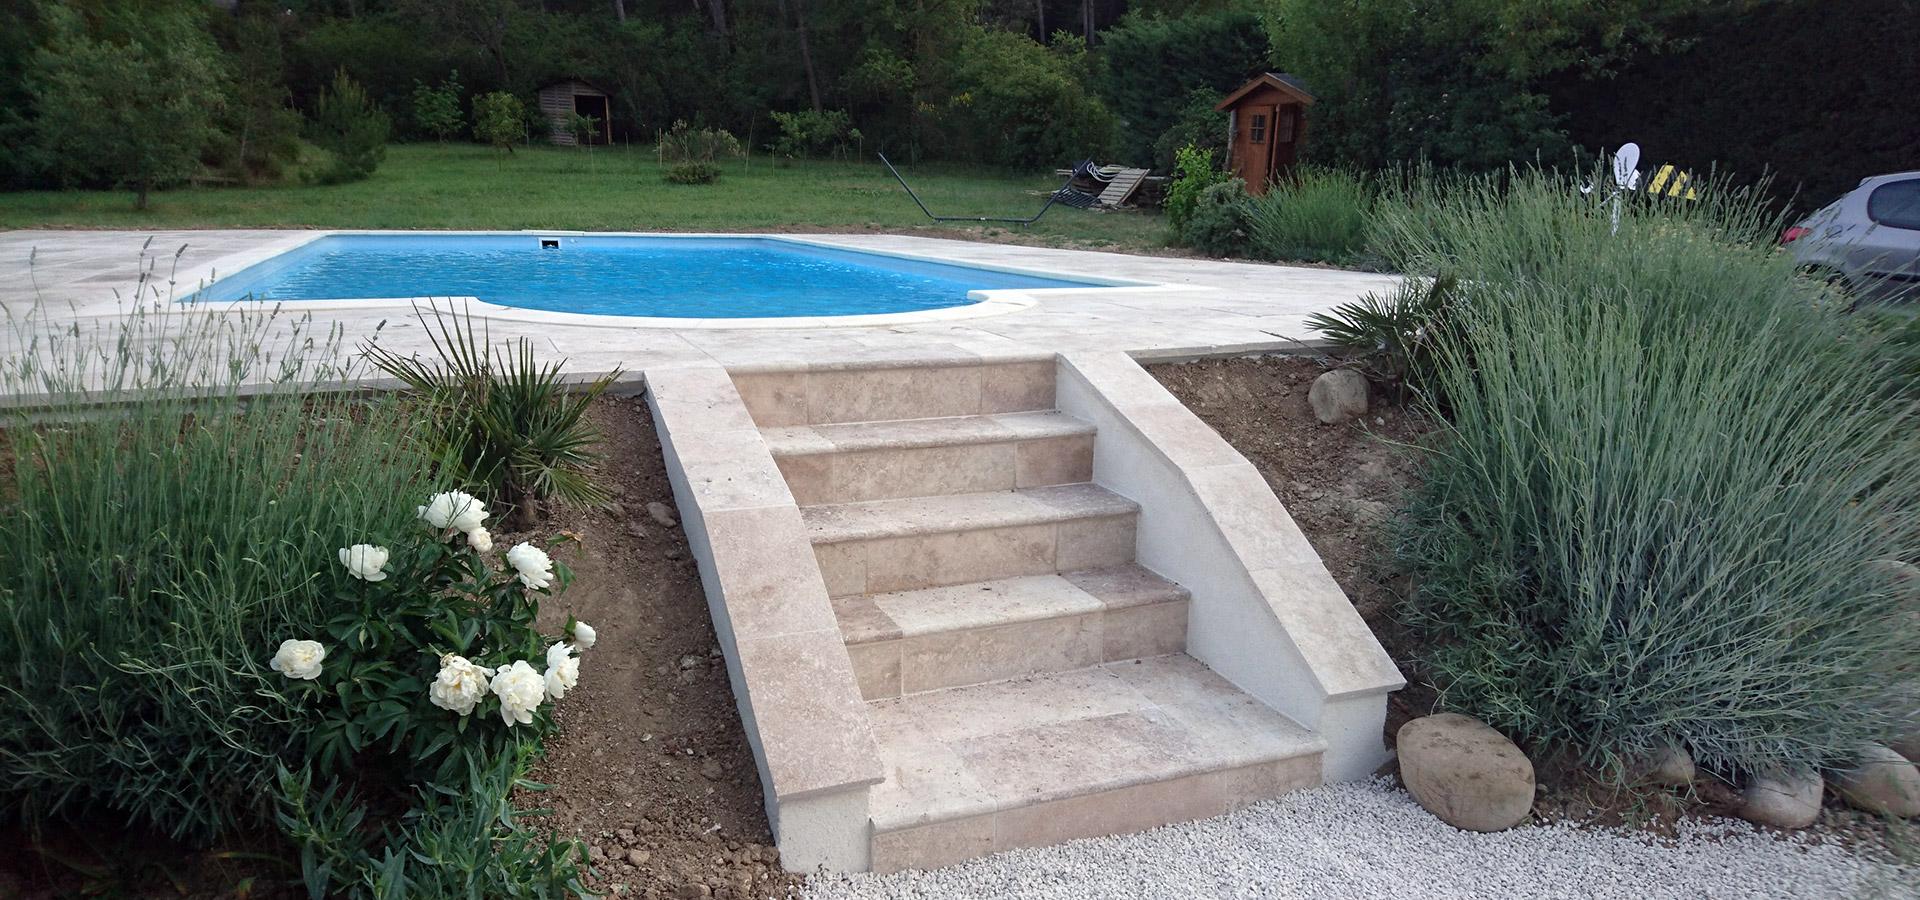 Amenagement piscine escalier - Amenagement terrasse piscine ...